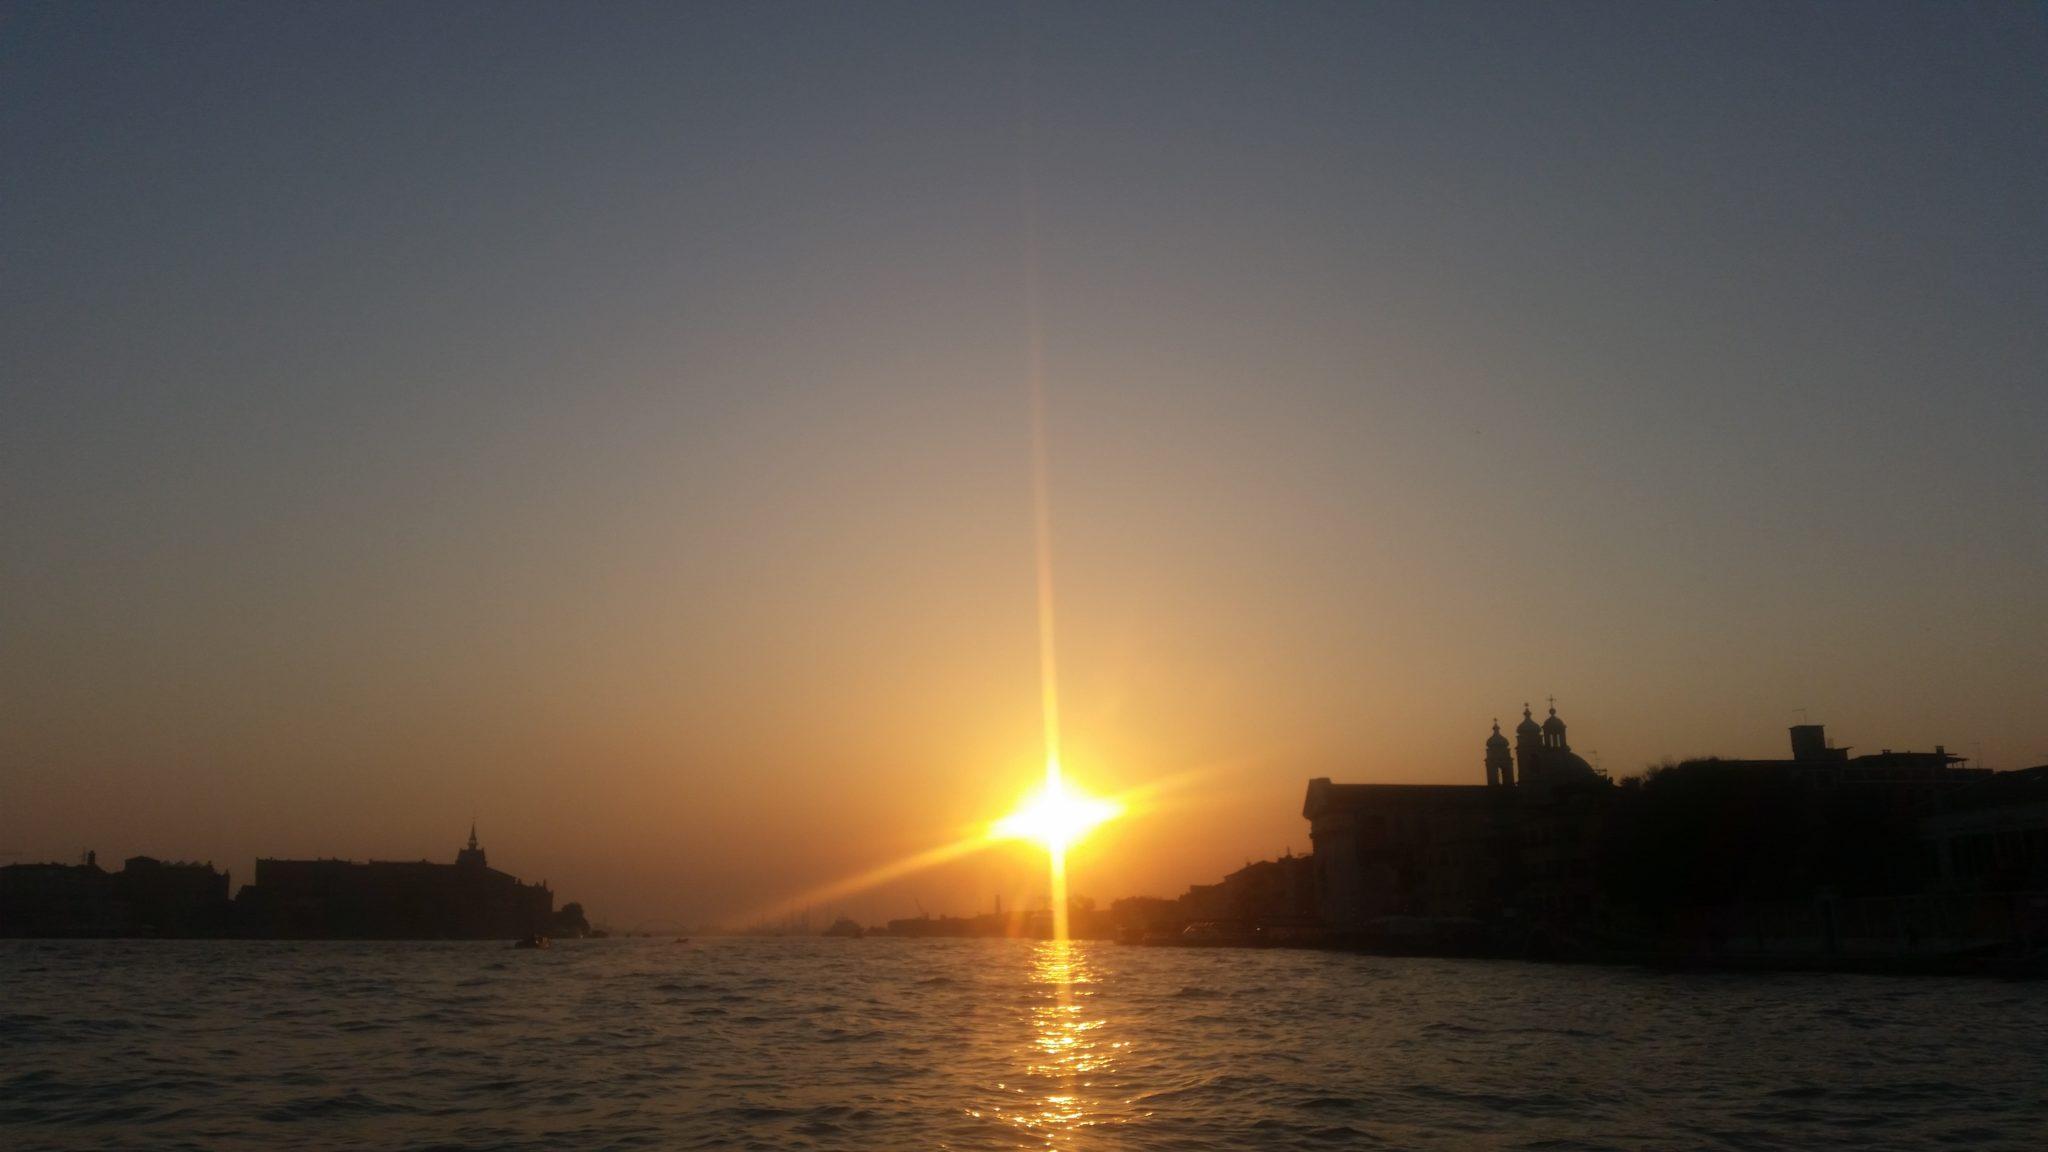 Venezia, tramonto in motoscafo - ArtsLife